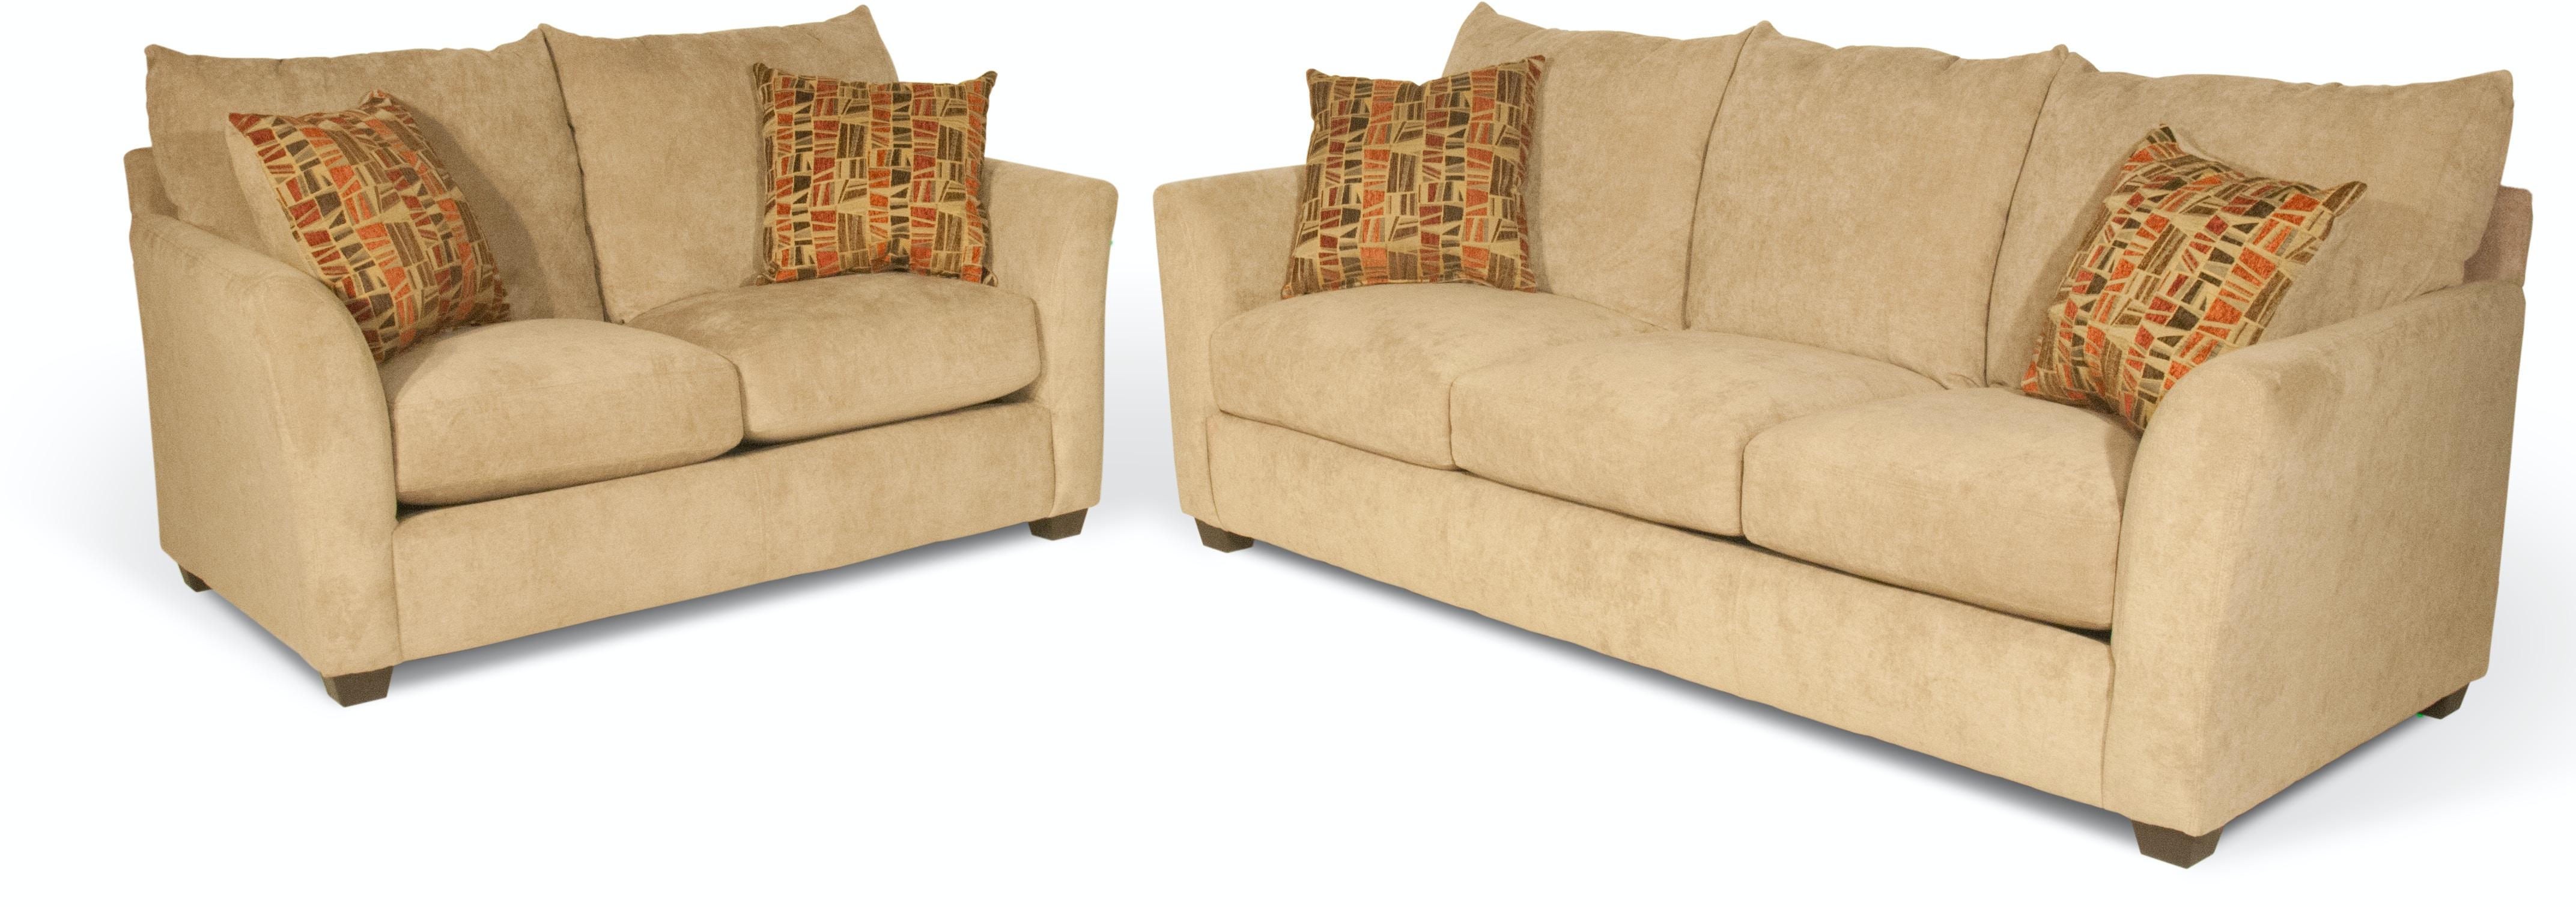 Jackson Furniture Living Room Kelton Sofa and Loveseat FREE